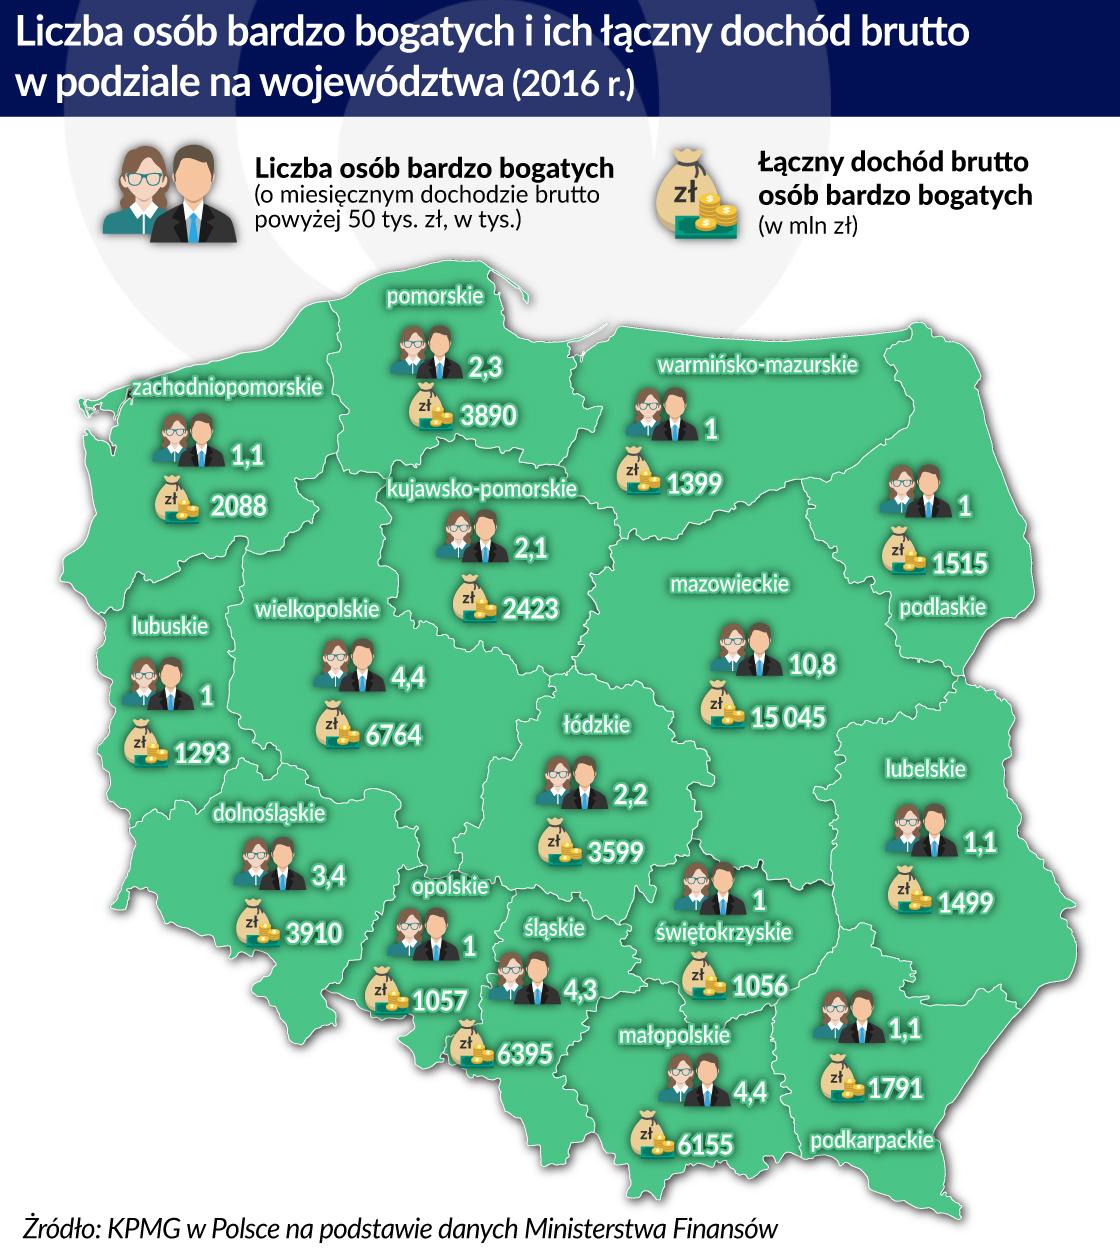 Bogaci Polacy - region